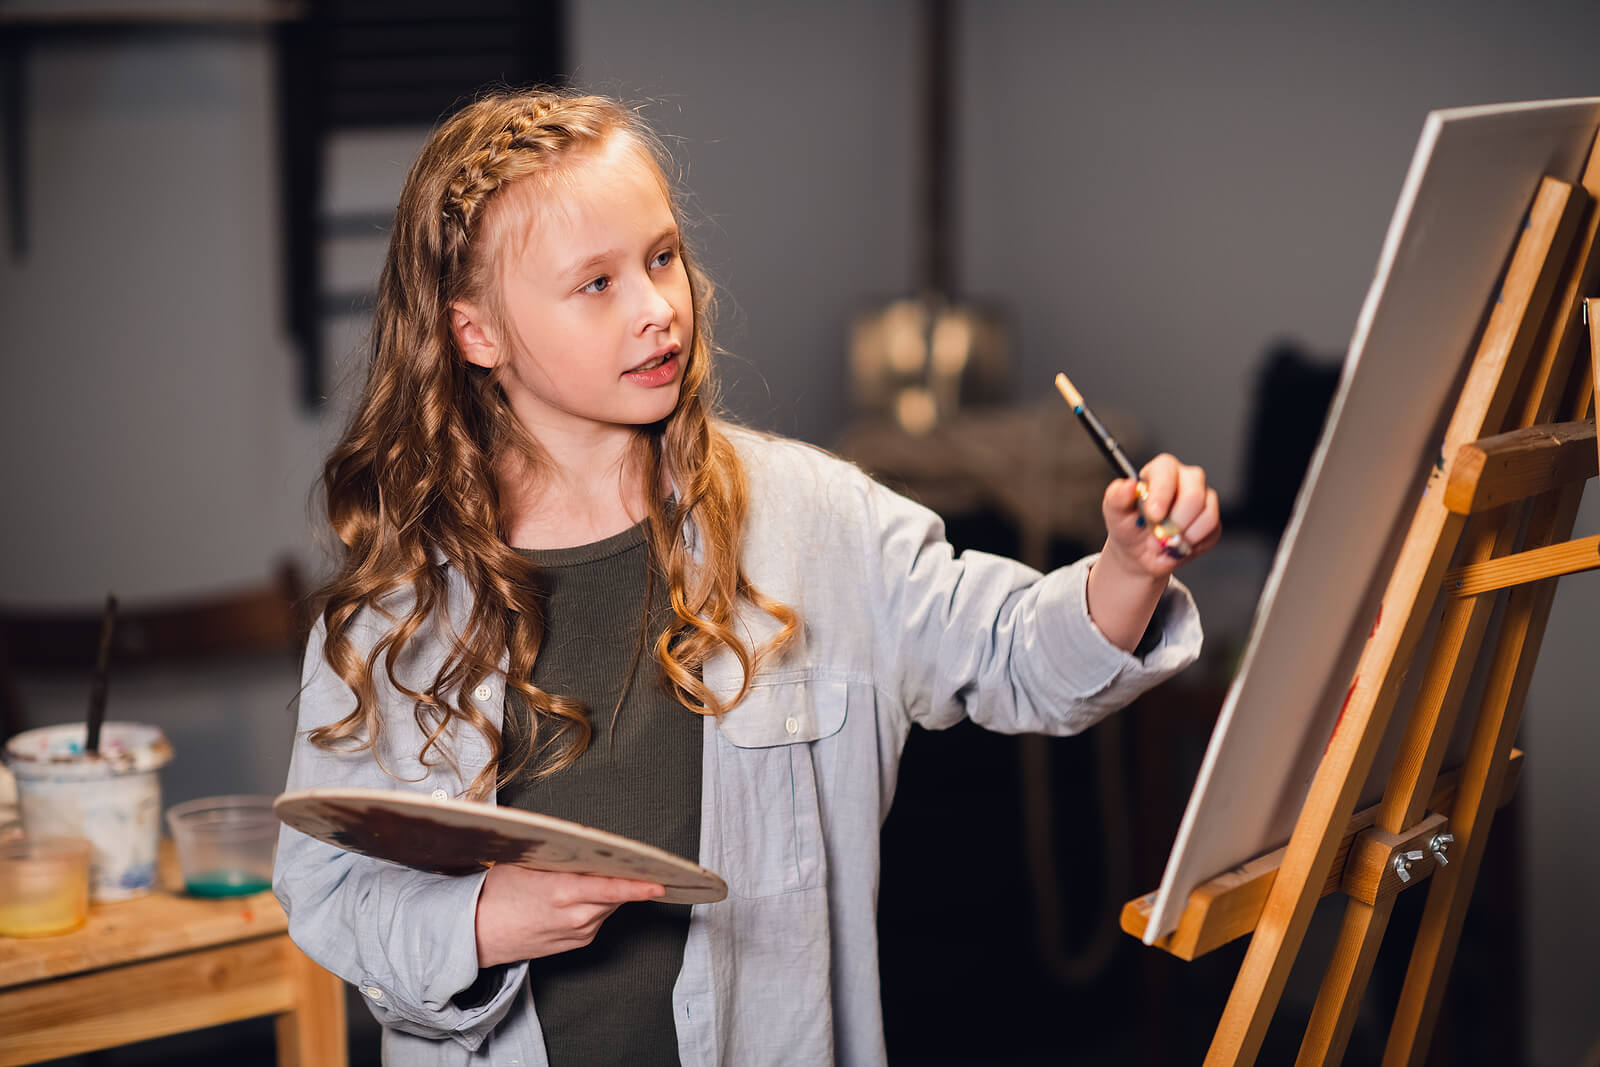 Niña en clases de pintura para fomentar sus talentos.